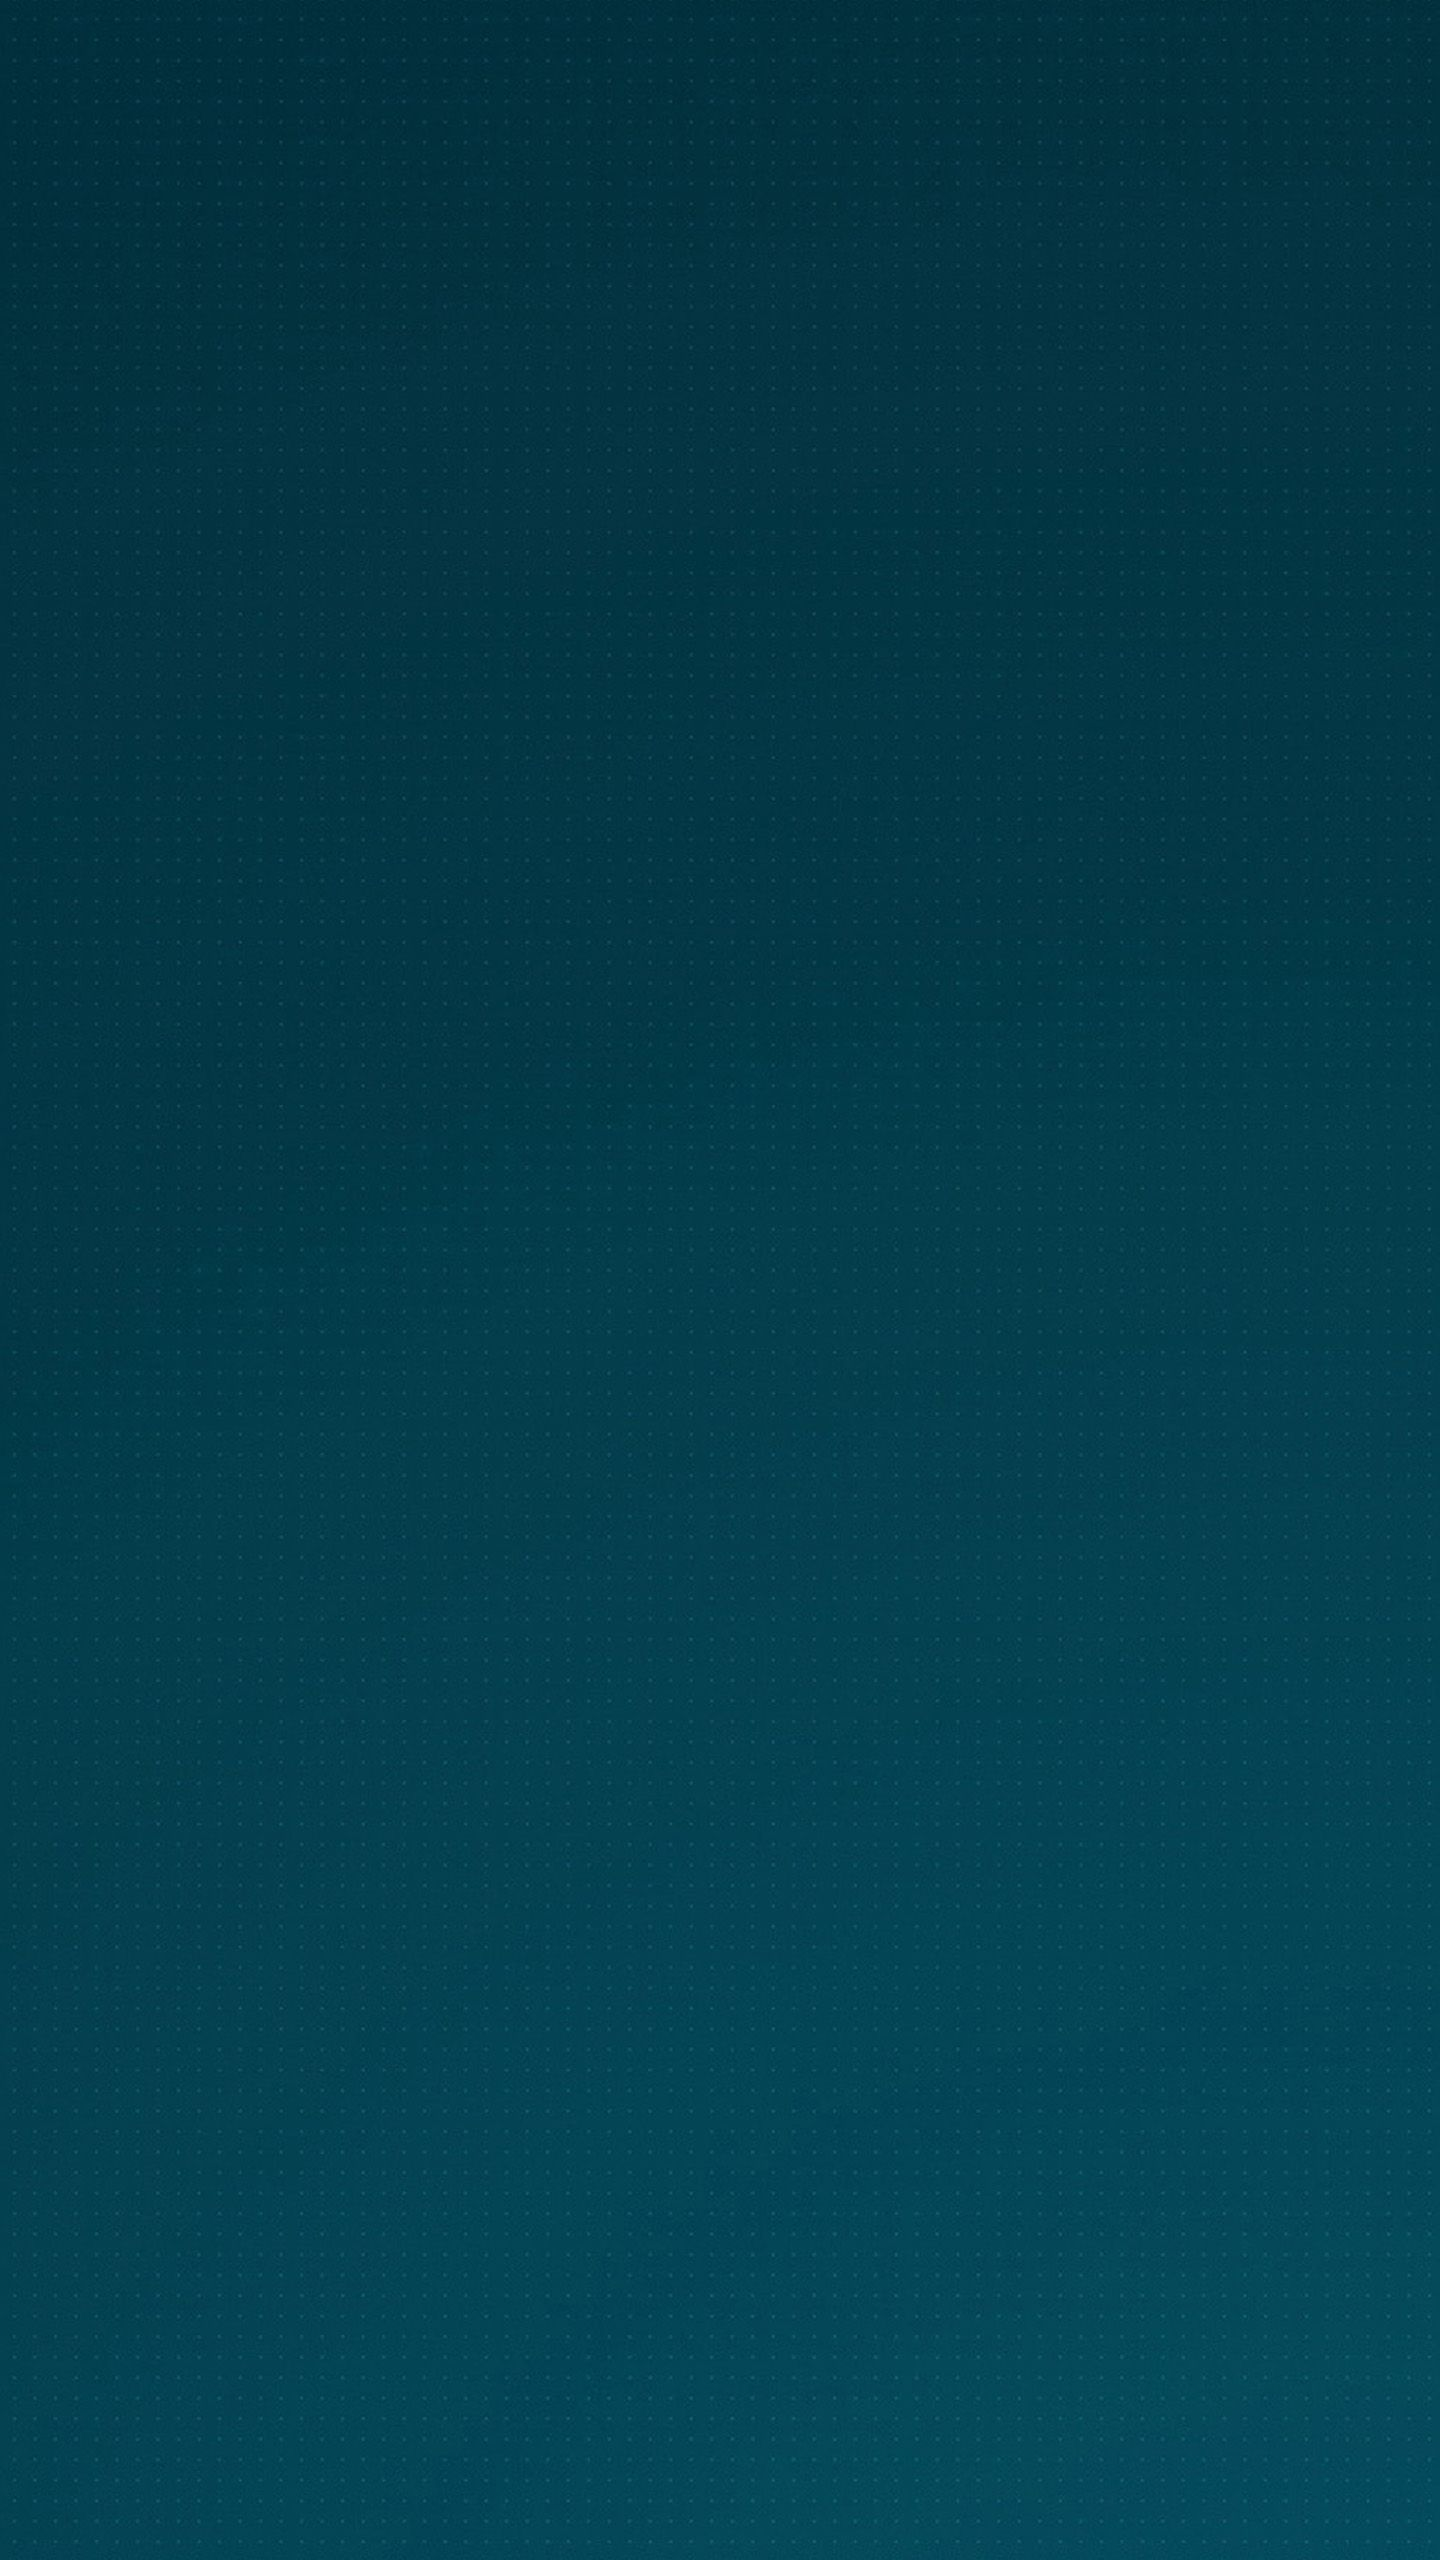 Texture Samsung Galaxy S6 Wallpapers 56 Blue Wallpaper Paint